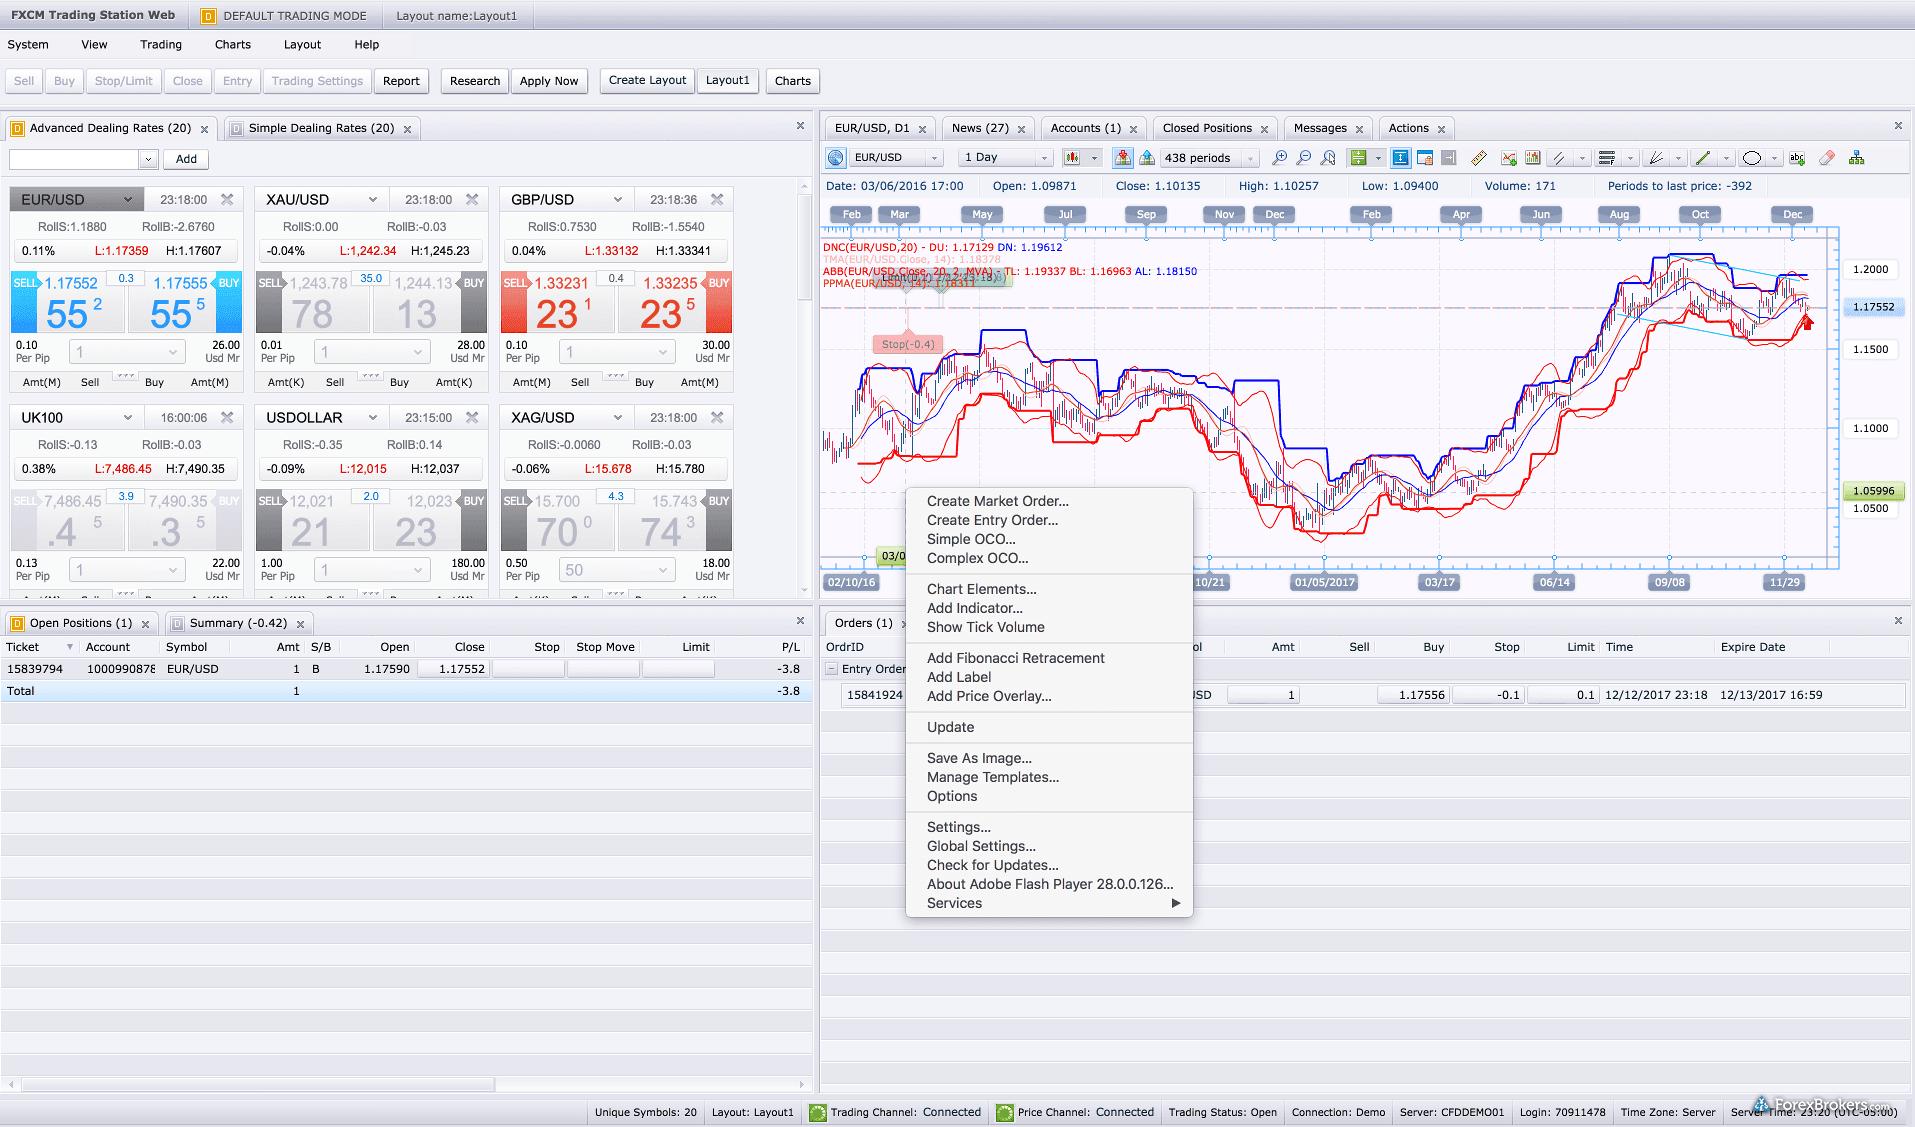 FXCM Trading Station web